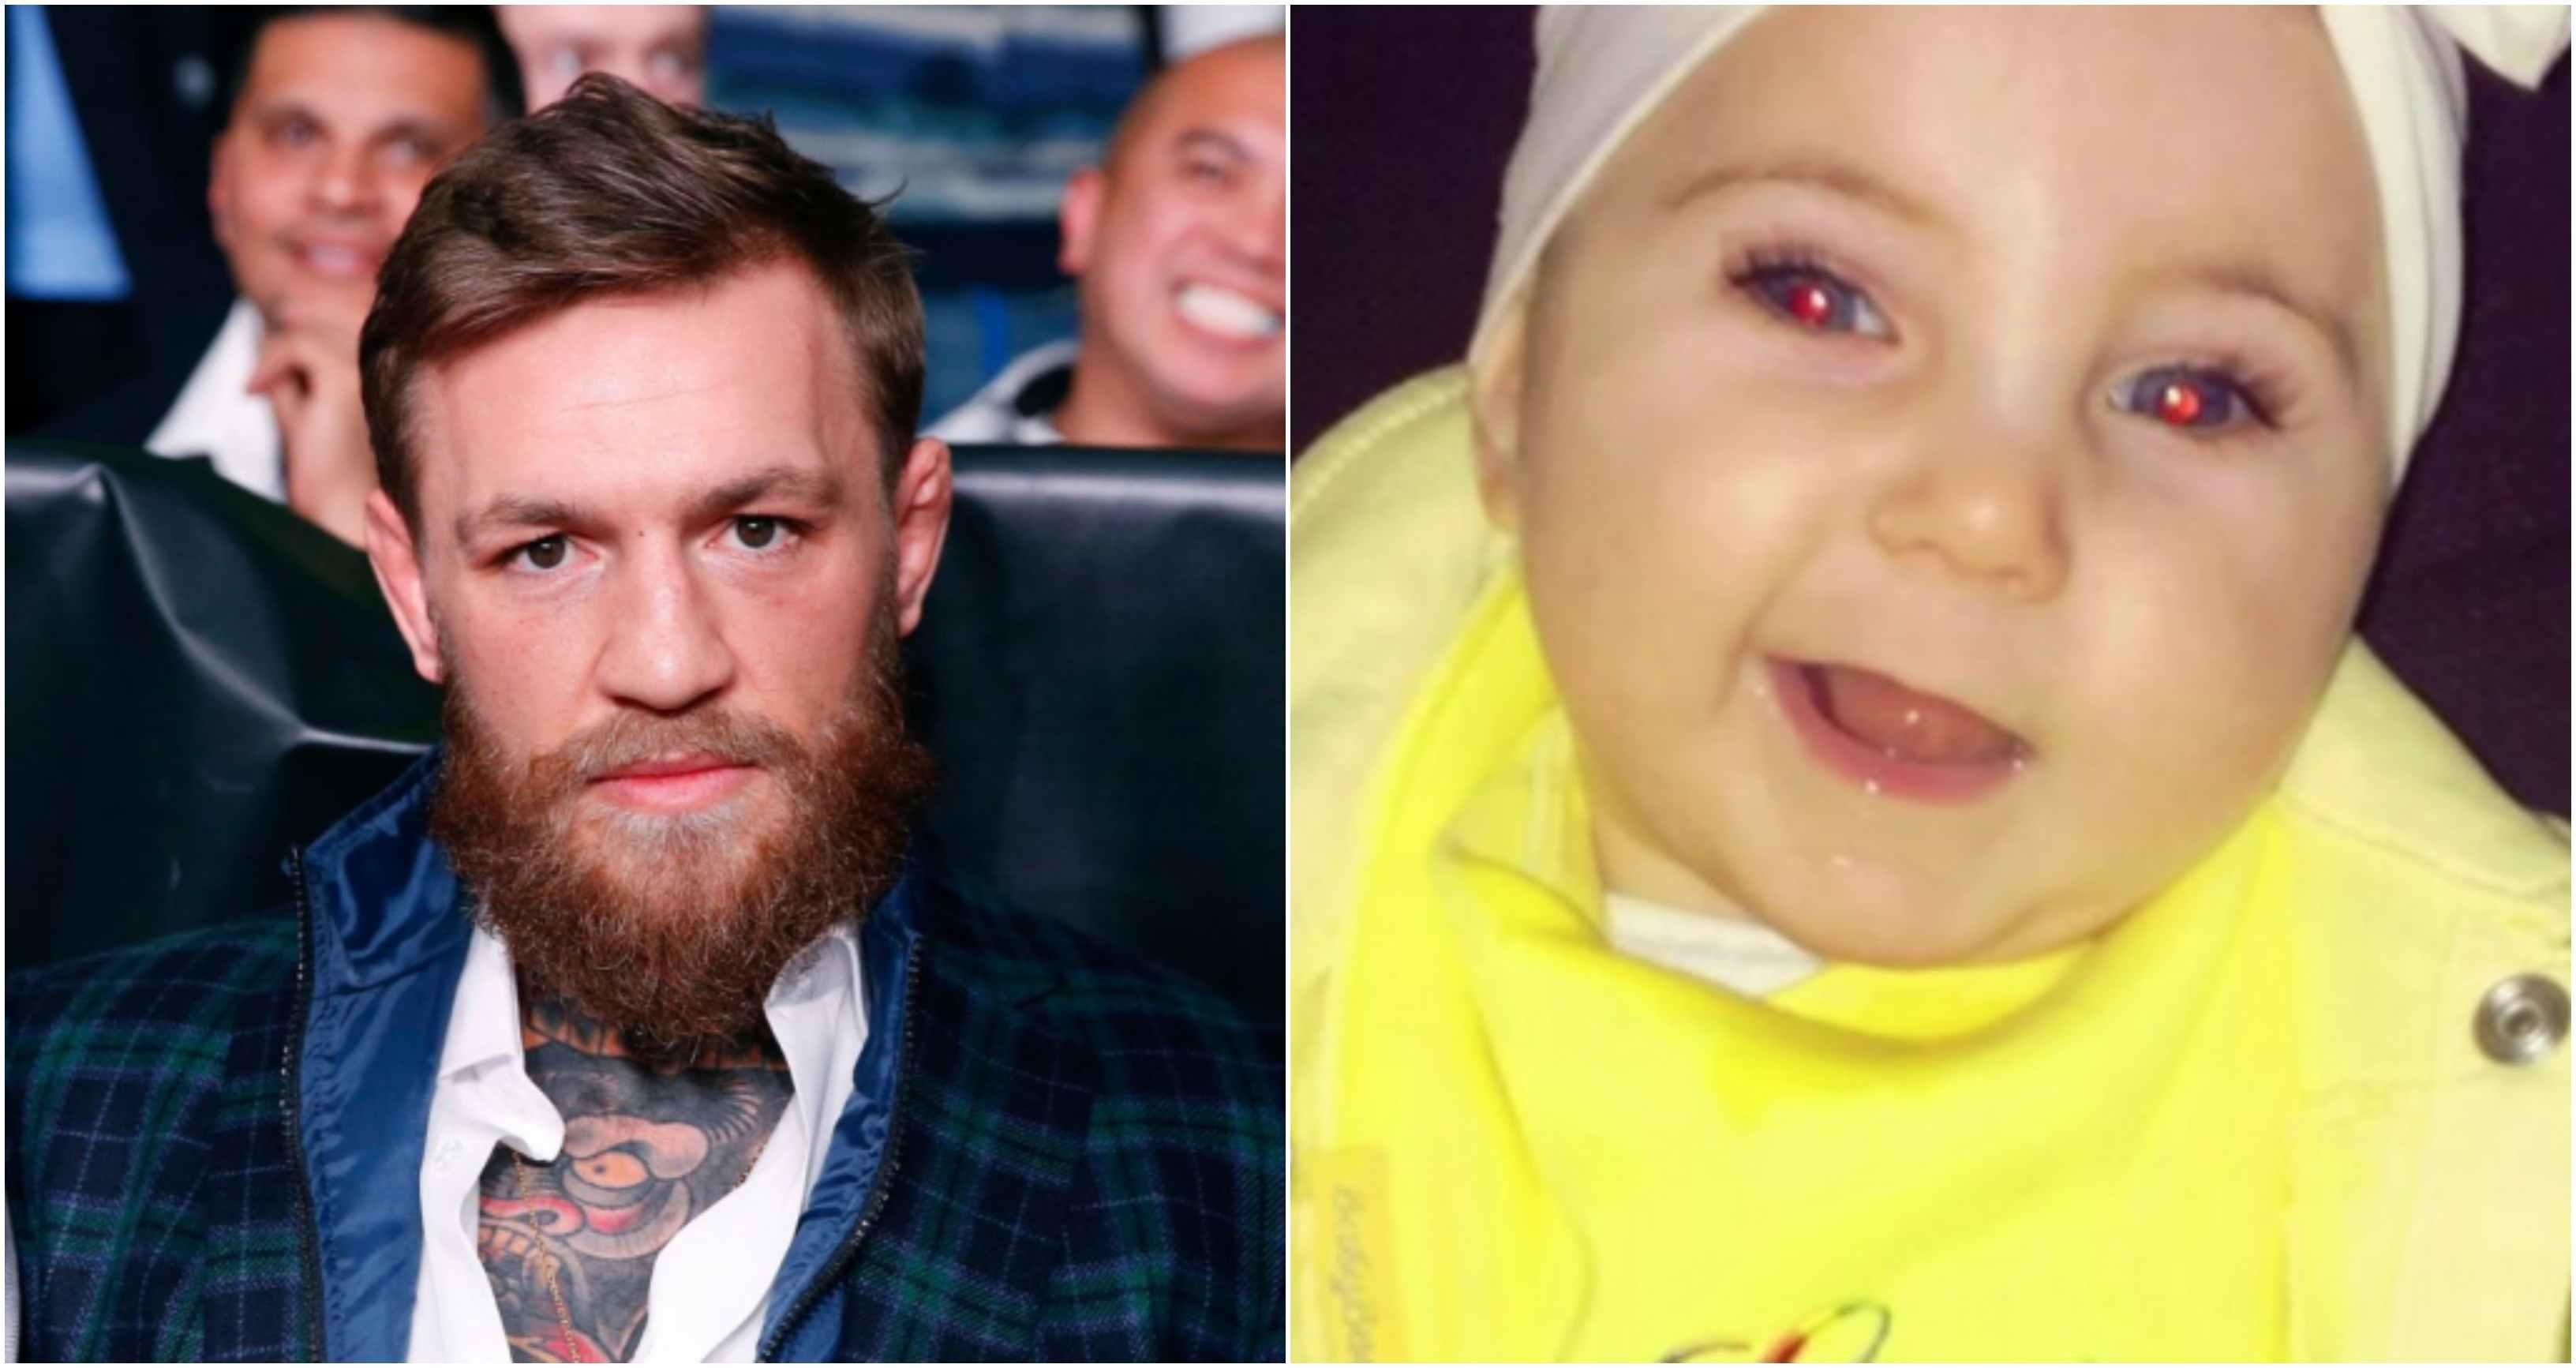 Conor McGregor donates ₹10 Lakhs to help treat Irish baby girl's genetic condition - McGregor